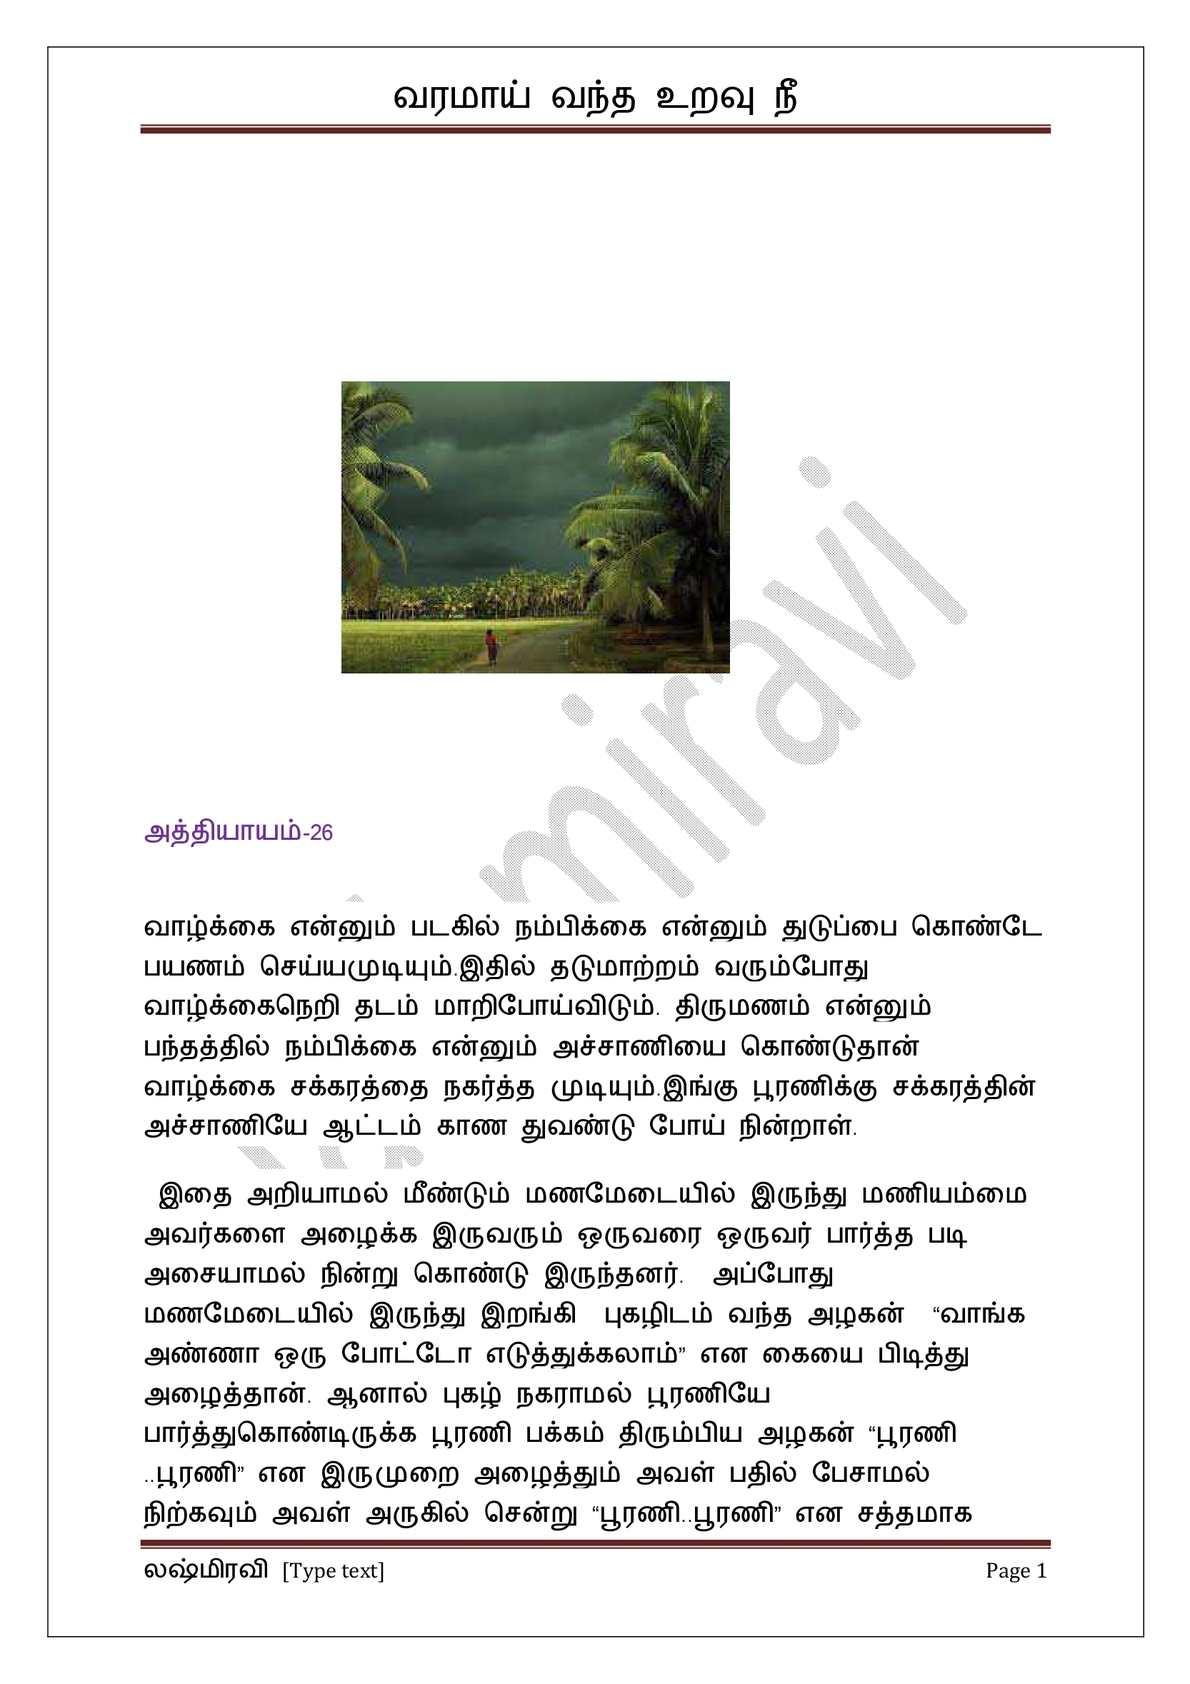 Varmaai Vantha Uravu Nee 26